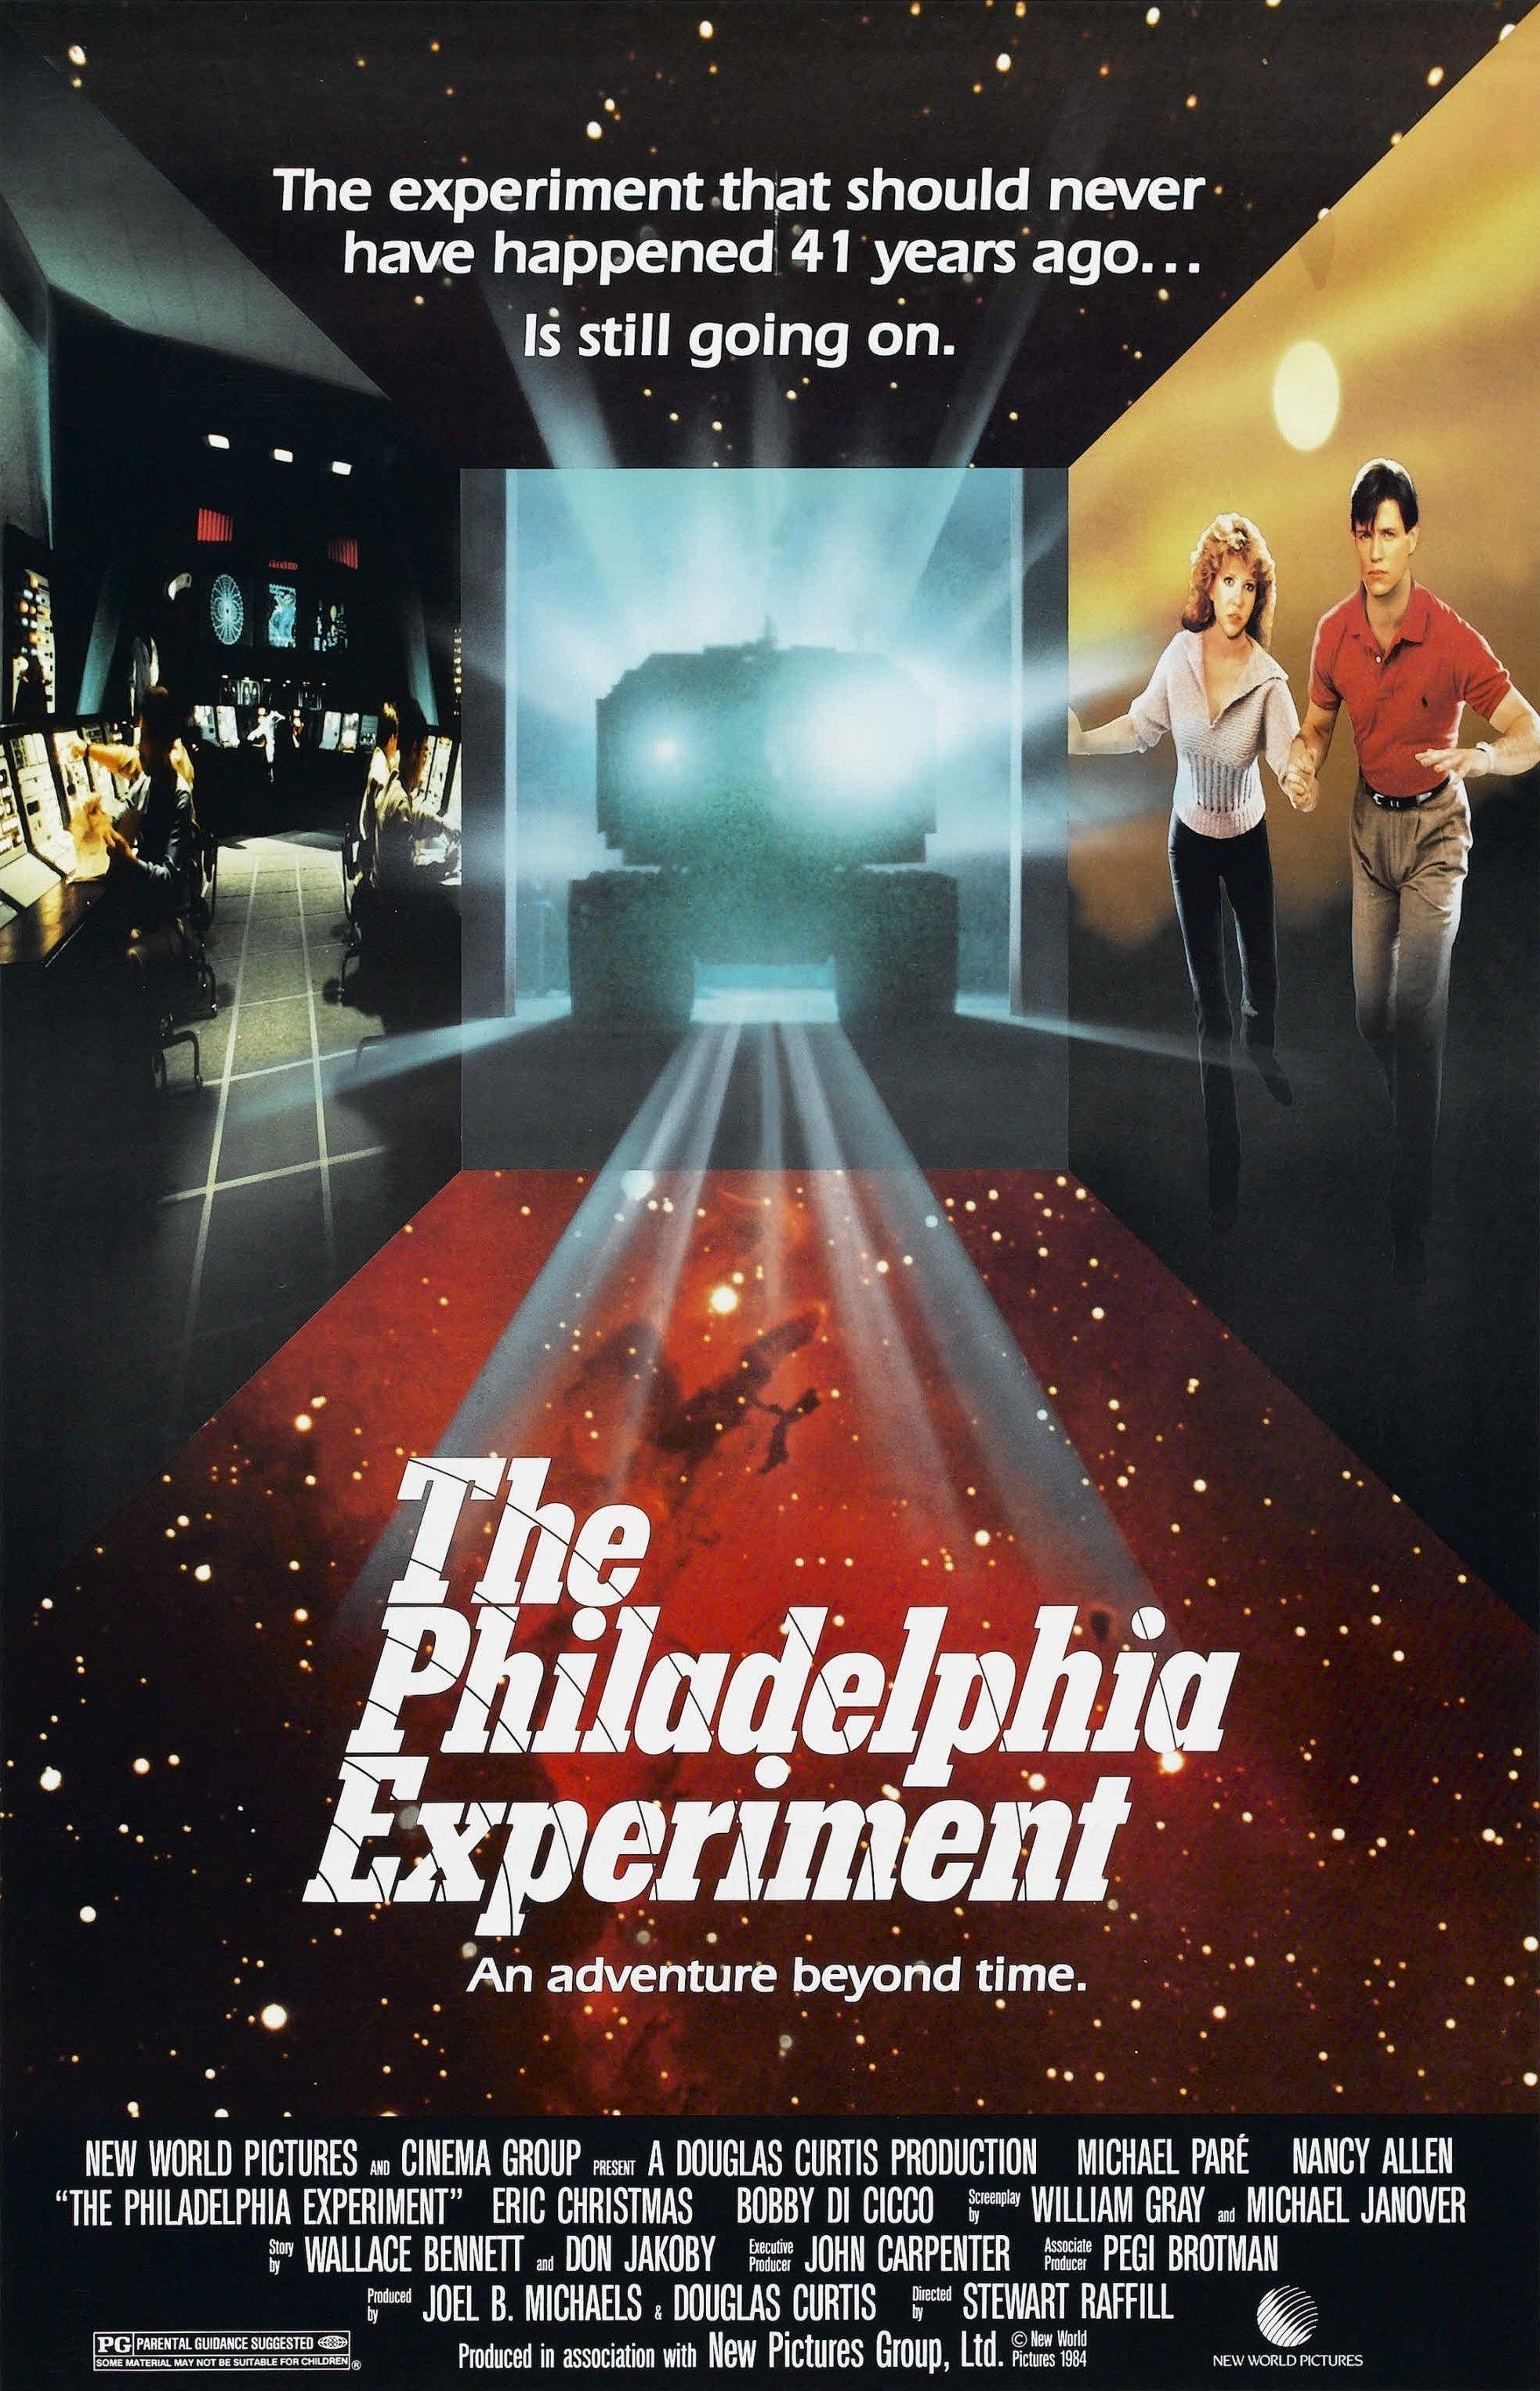 Pin By Luis Maria Leza Suarez On More Films Down The Years Philadelphia Experiment Philadelphia Experiment Movie Science Fiction Movie Posters